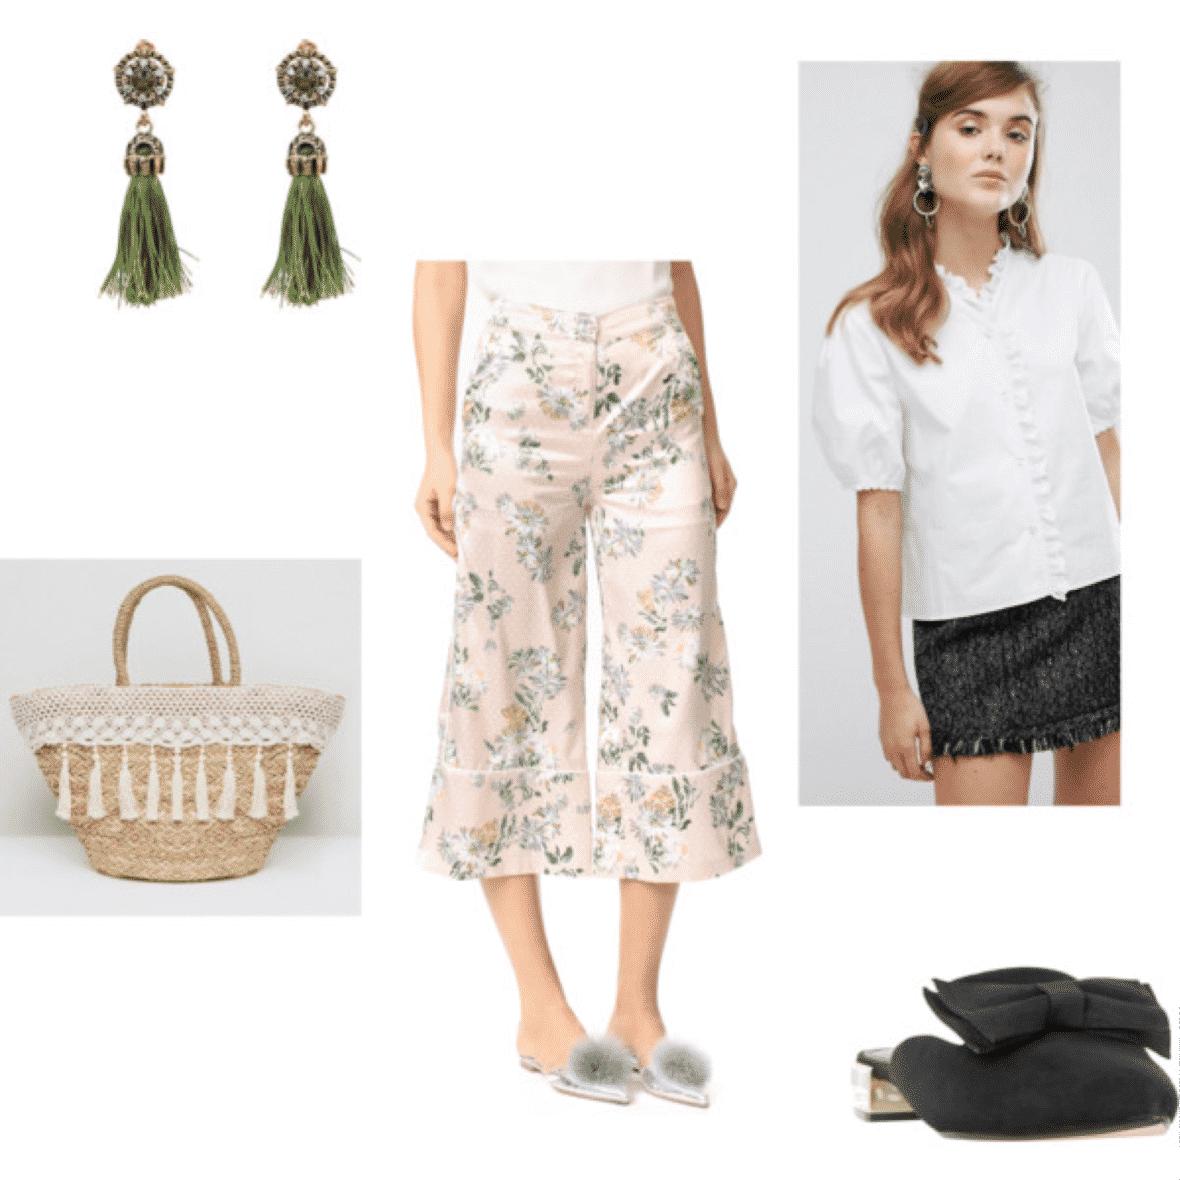 julia engel outfit 1: floral pants, woven bag, white top, earrings